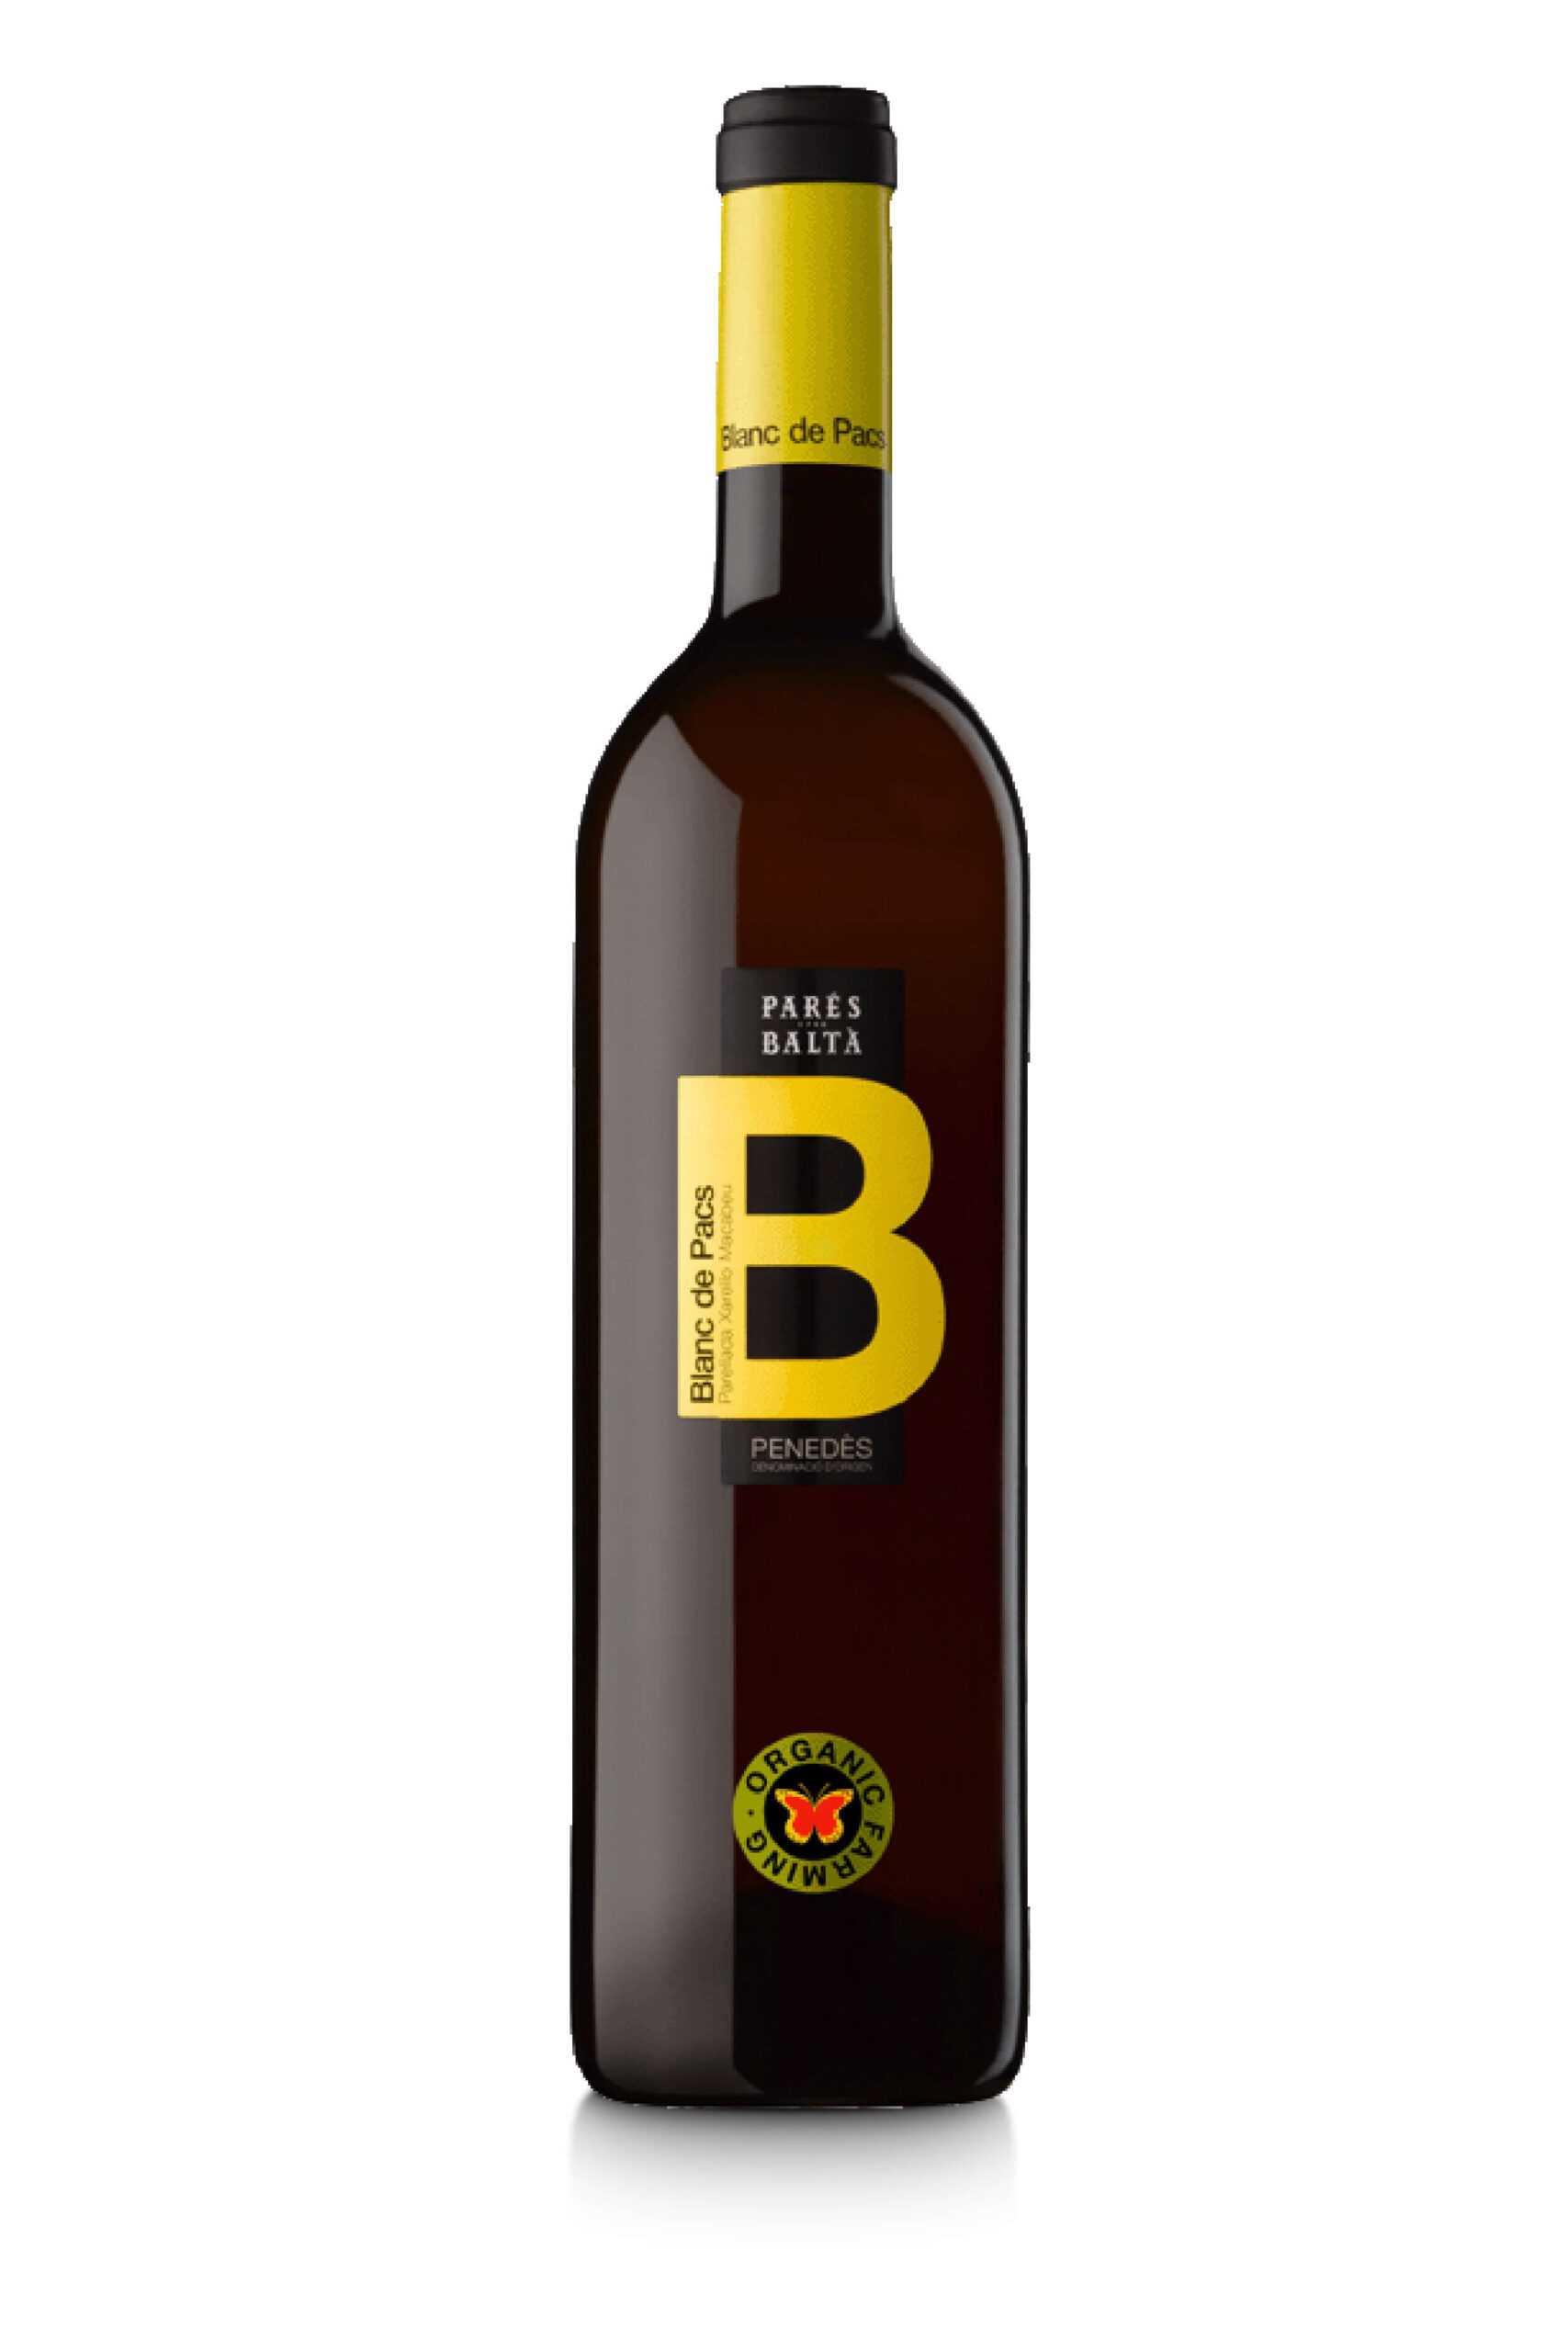 Blanc de Pacs 2020 vino blanc de pacs pares balta scaled